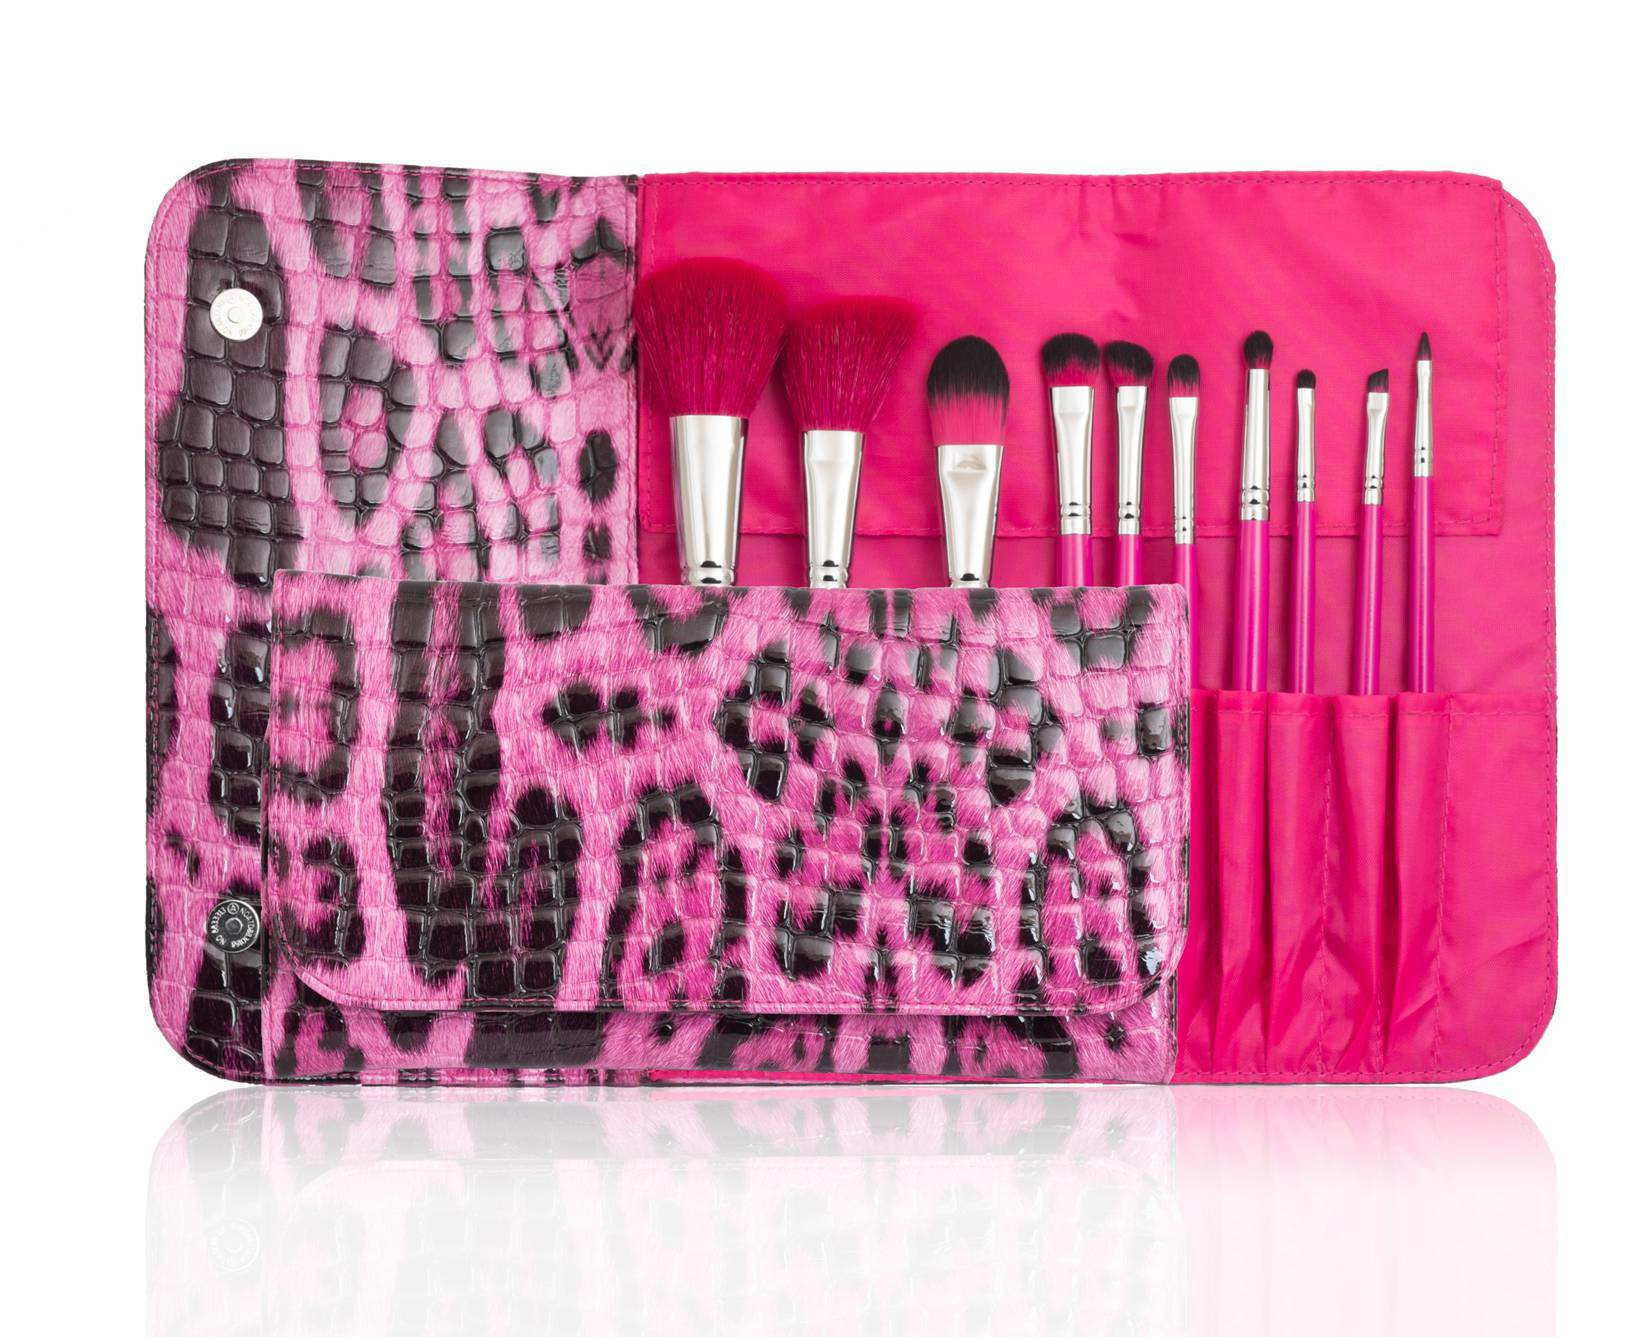 Hot 12PCS Makeup Brush Cosmetic Brush with Natural Hair